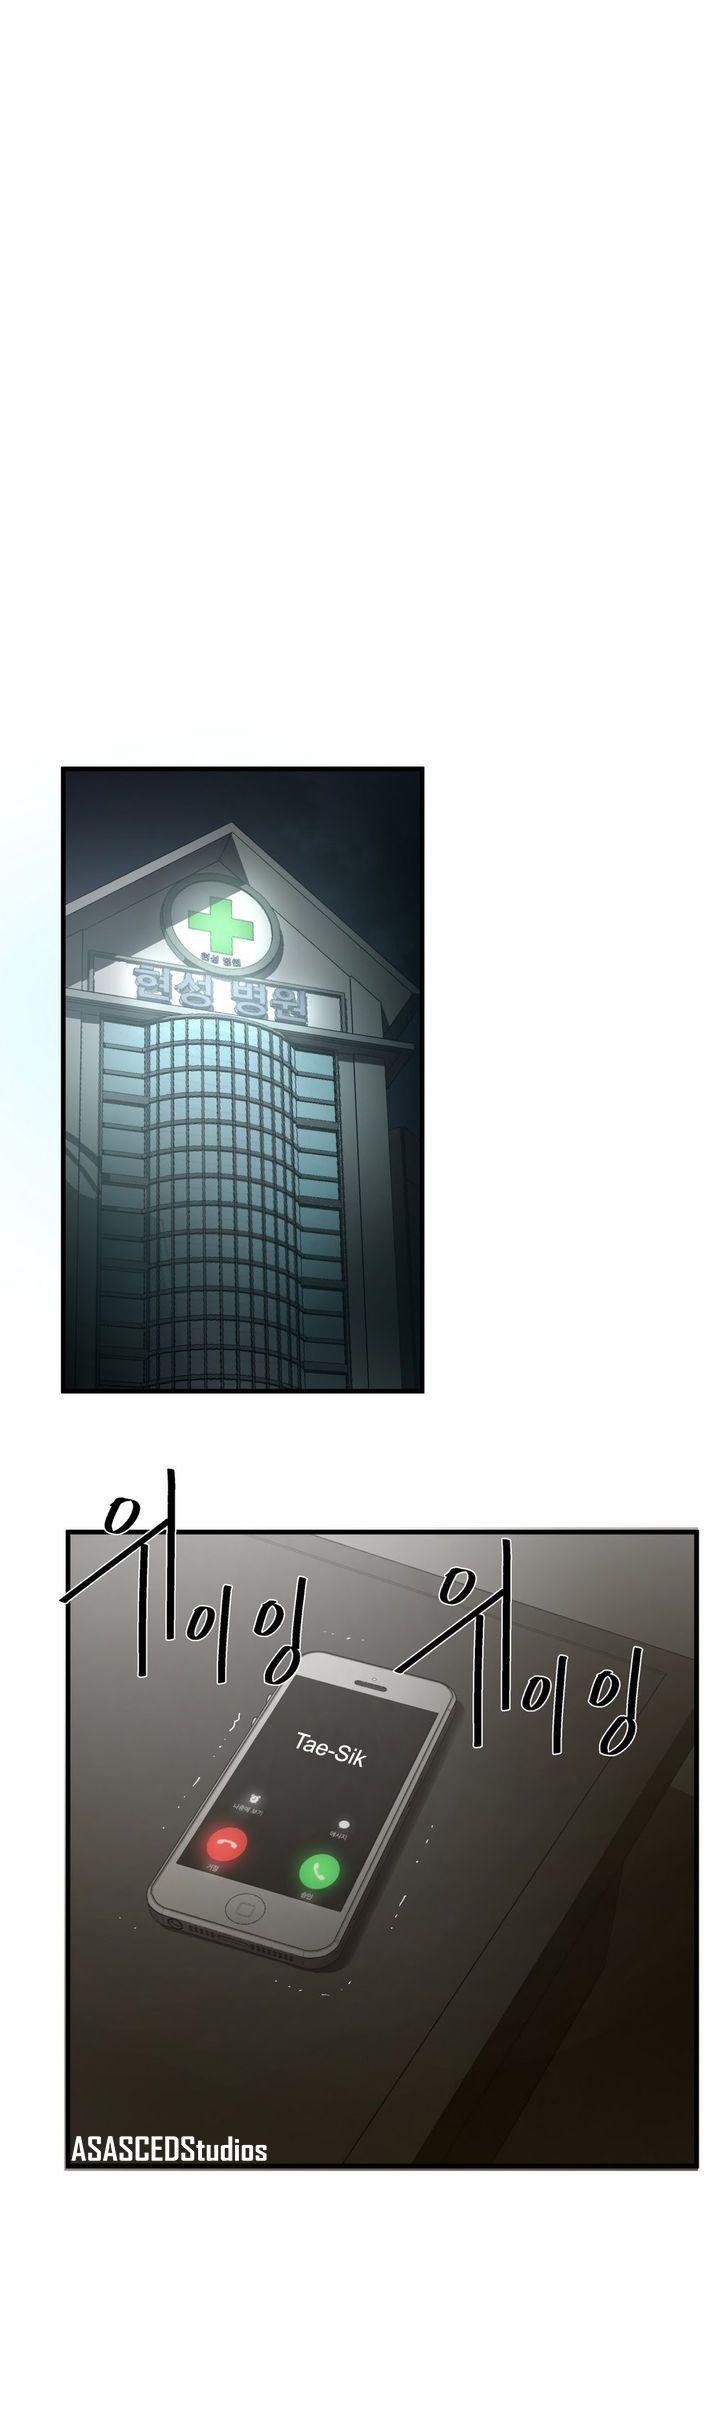 https://c5.ninemanga.com/es_manga/pic2/58/19386/503865/4c21d6da76d2be1650d4607ad476ac95.jpg Page 9